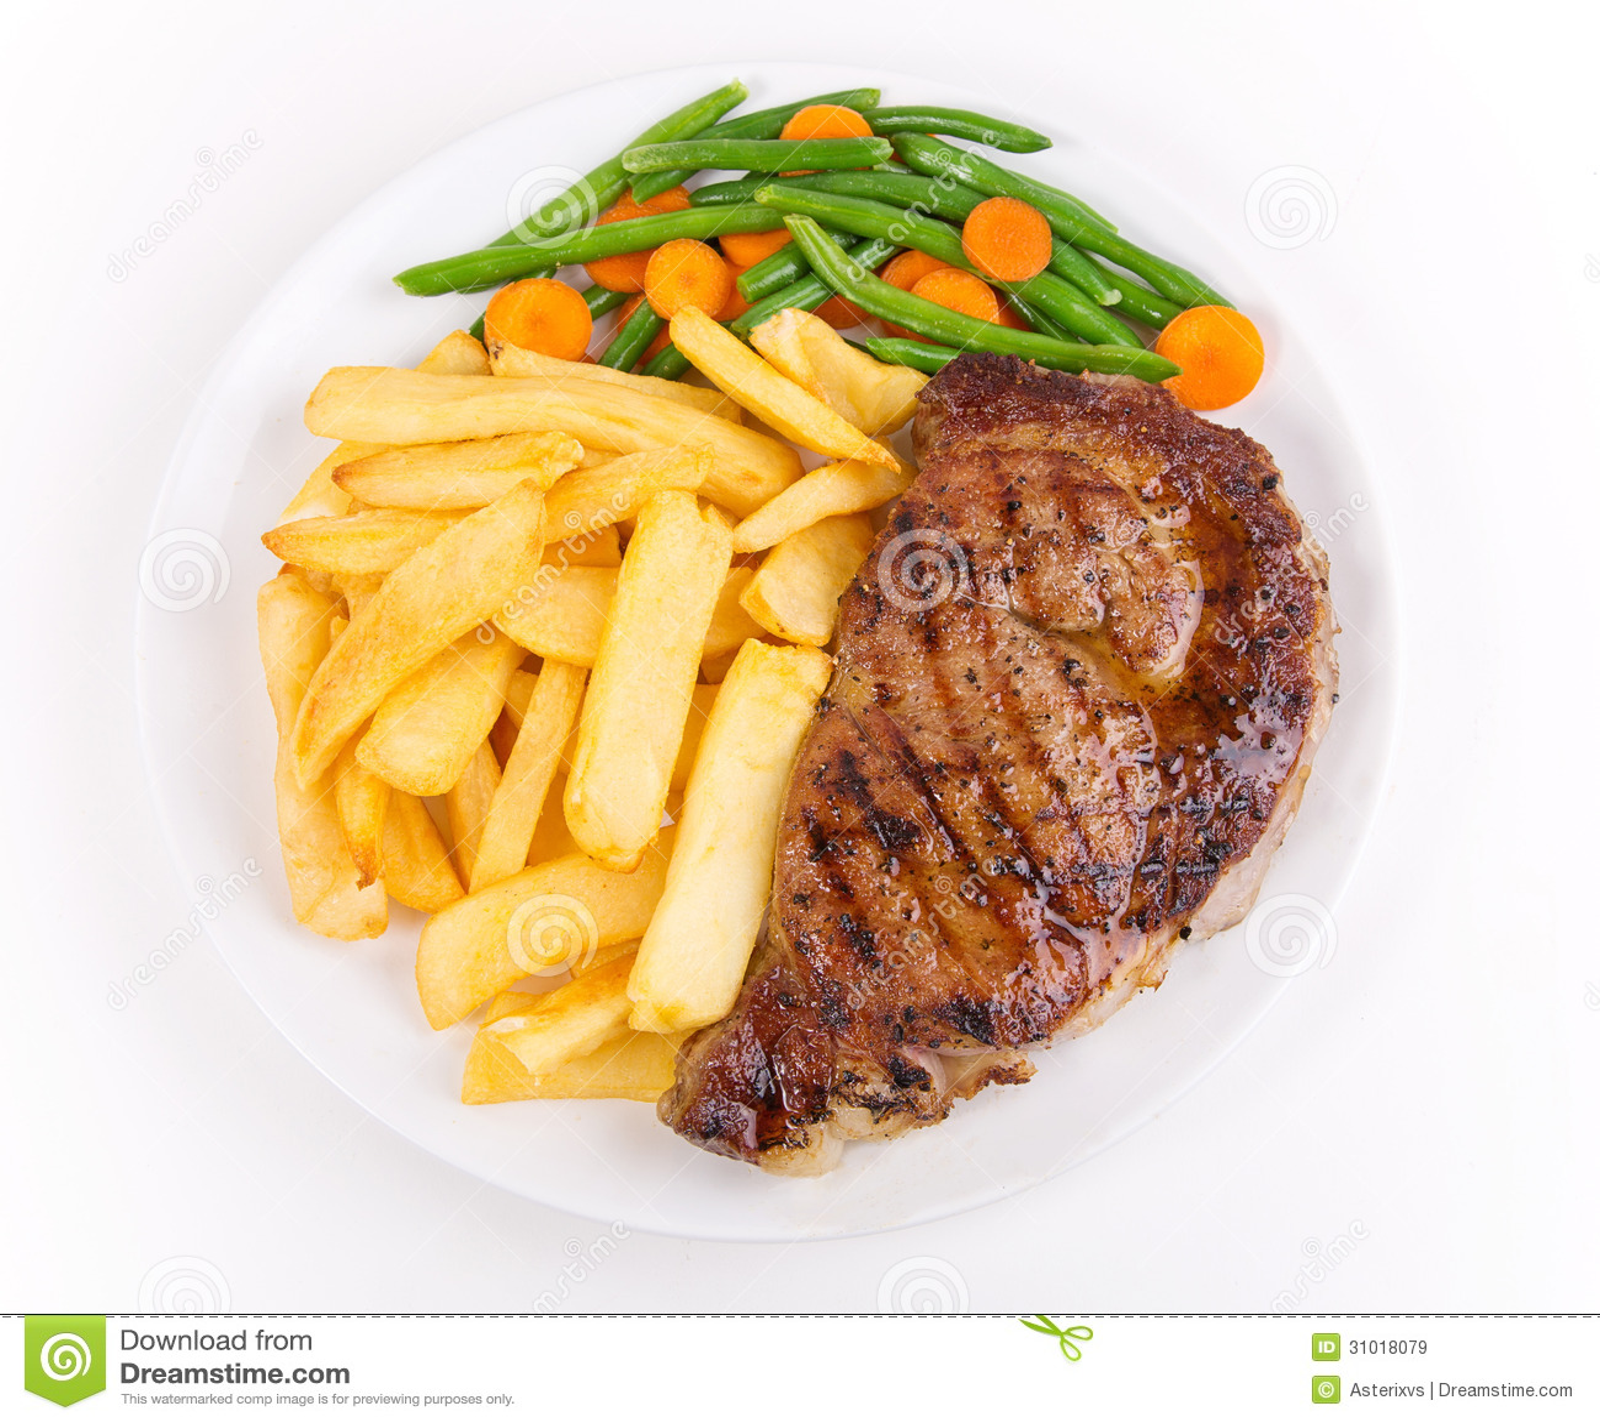 how to make a tender ribeye steak on the stove